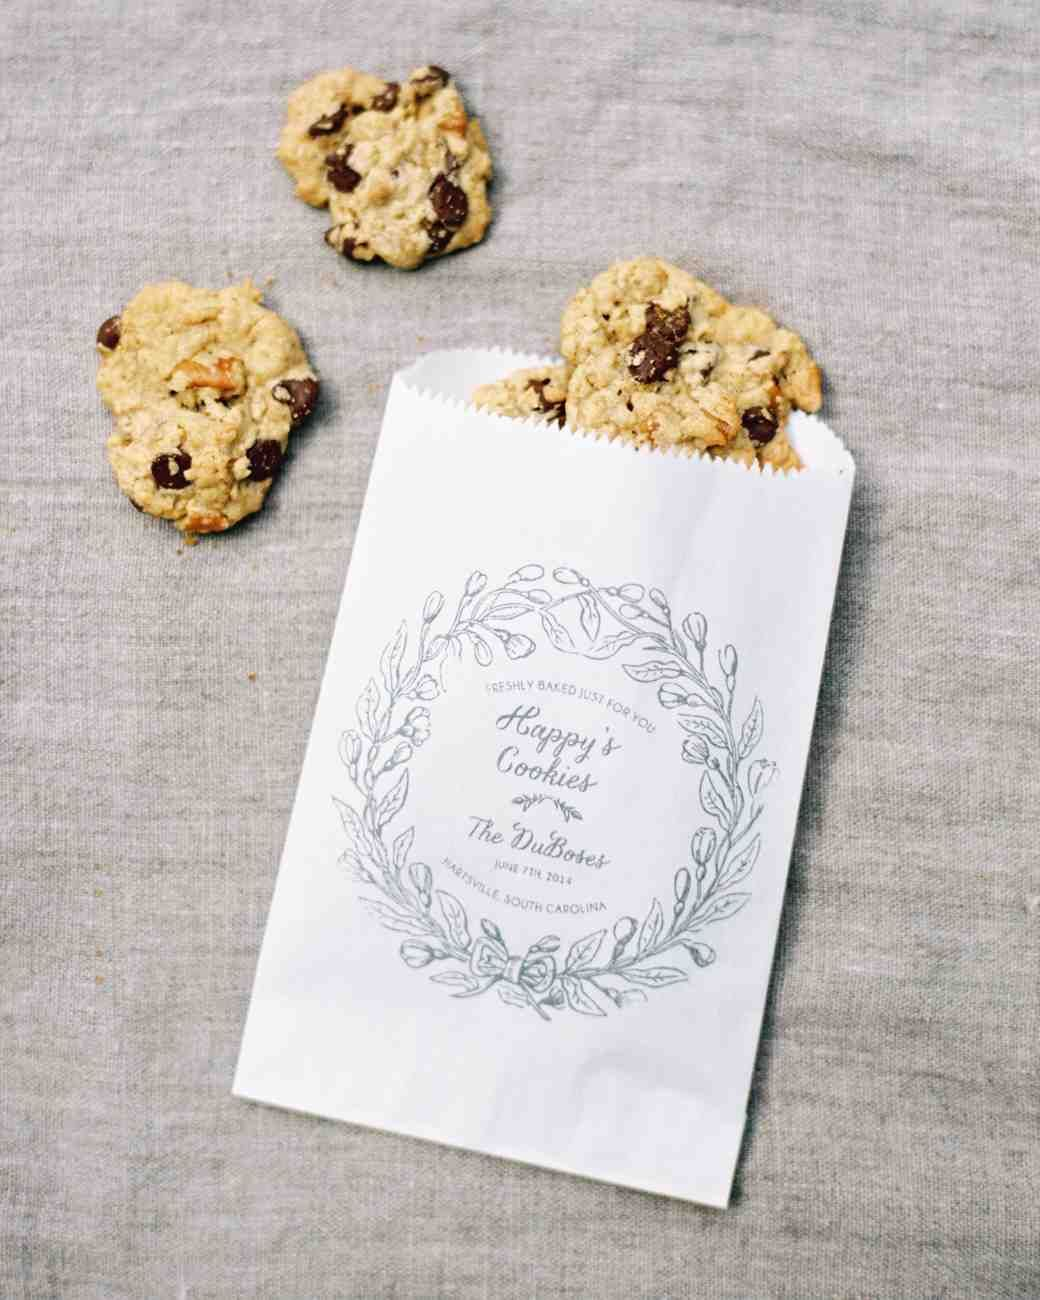 Best Favor Ideas From Spring Weddings   Martha stewart weddings ...